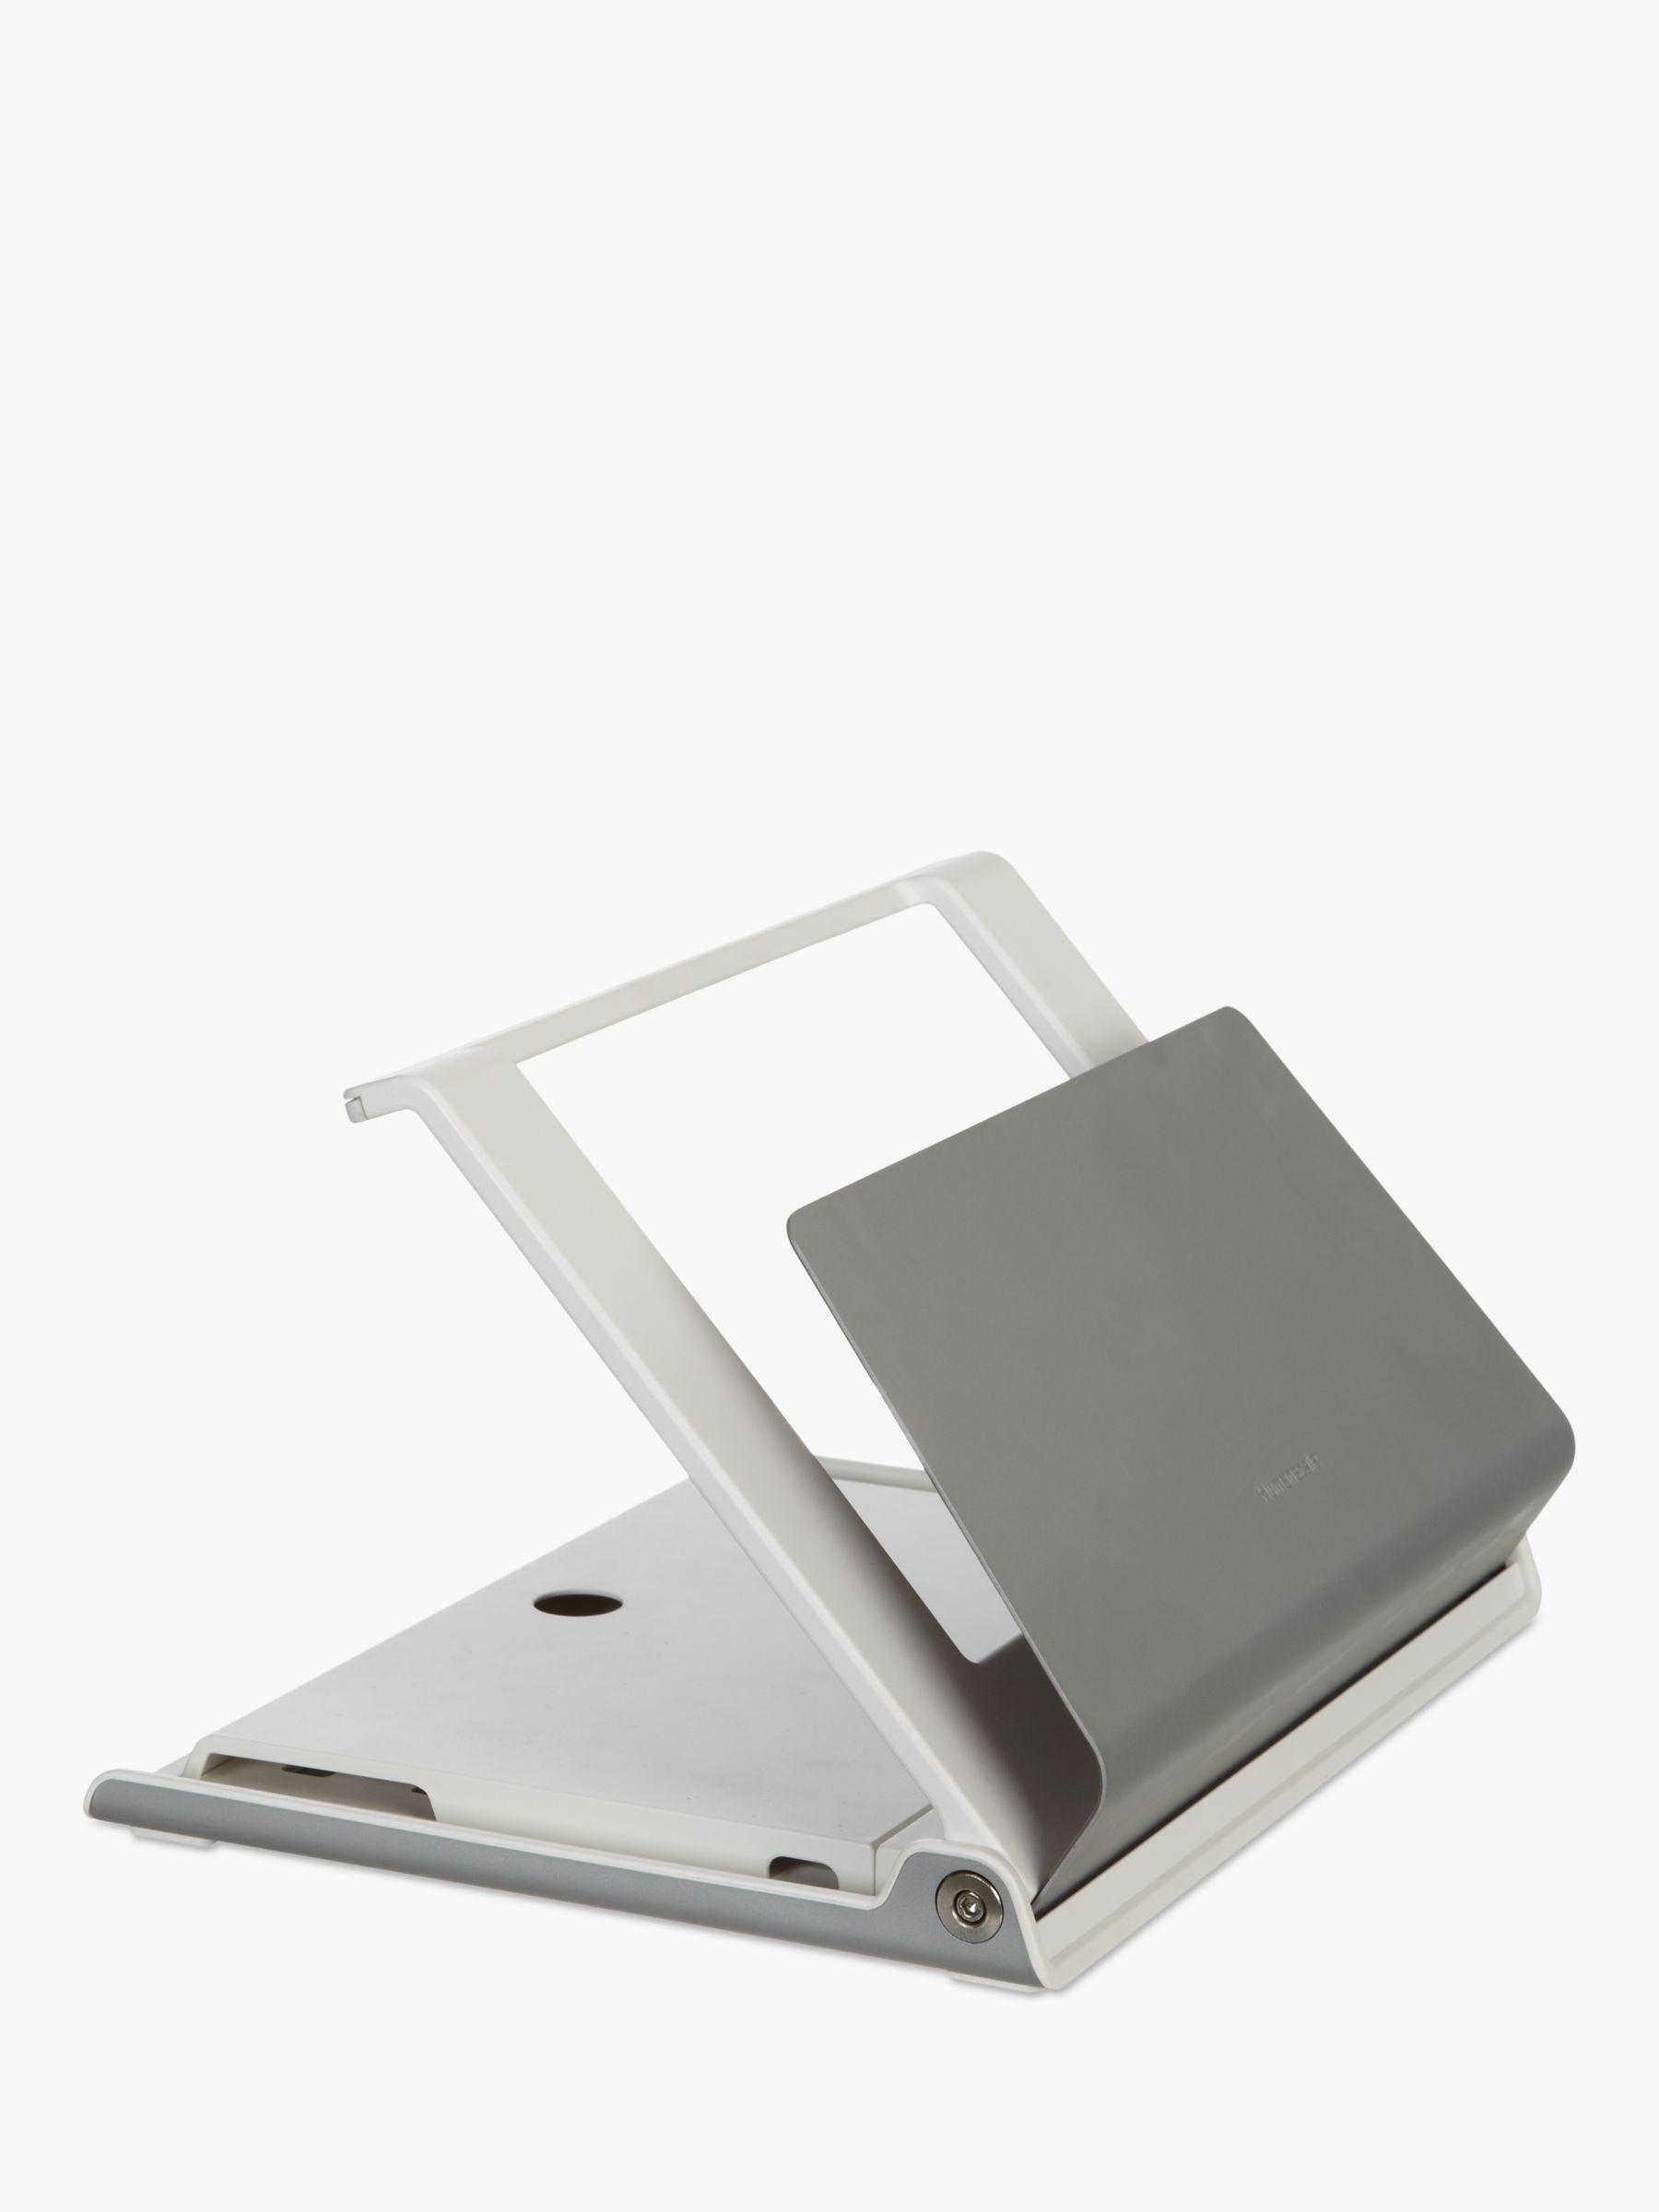 Humanscale Humanscale L6 Laptop Holder